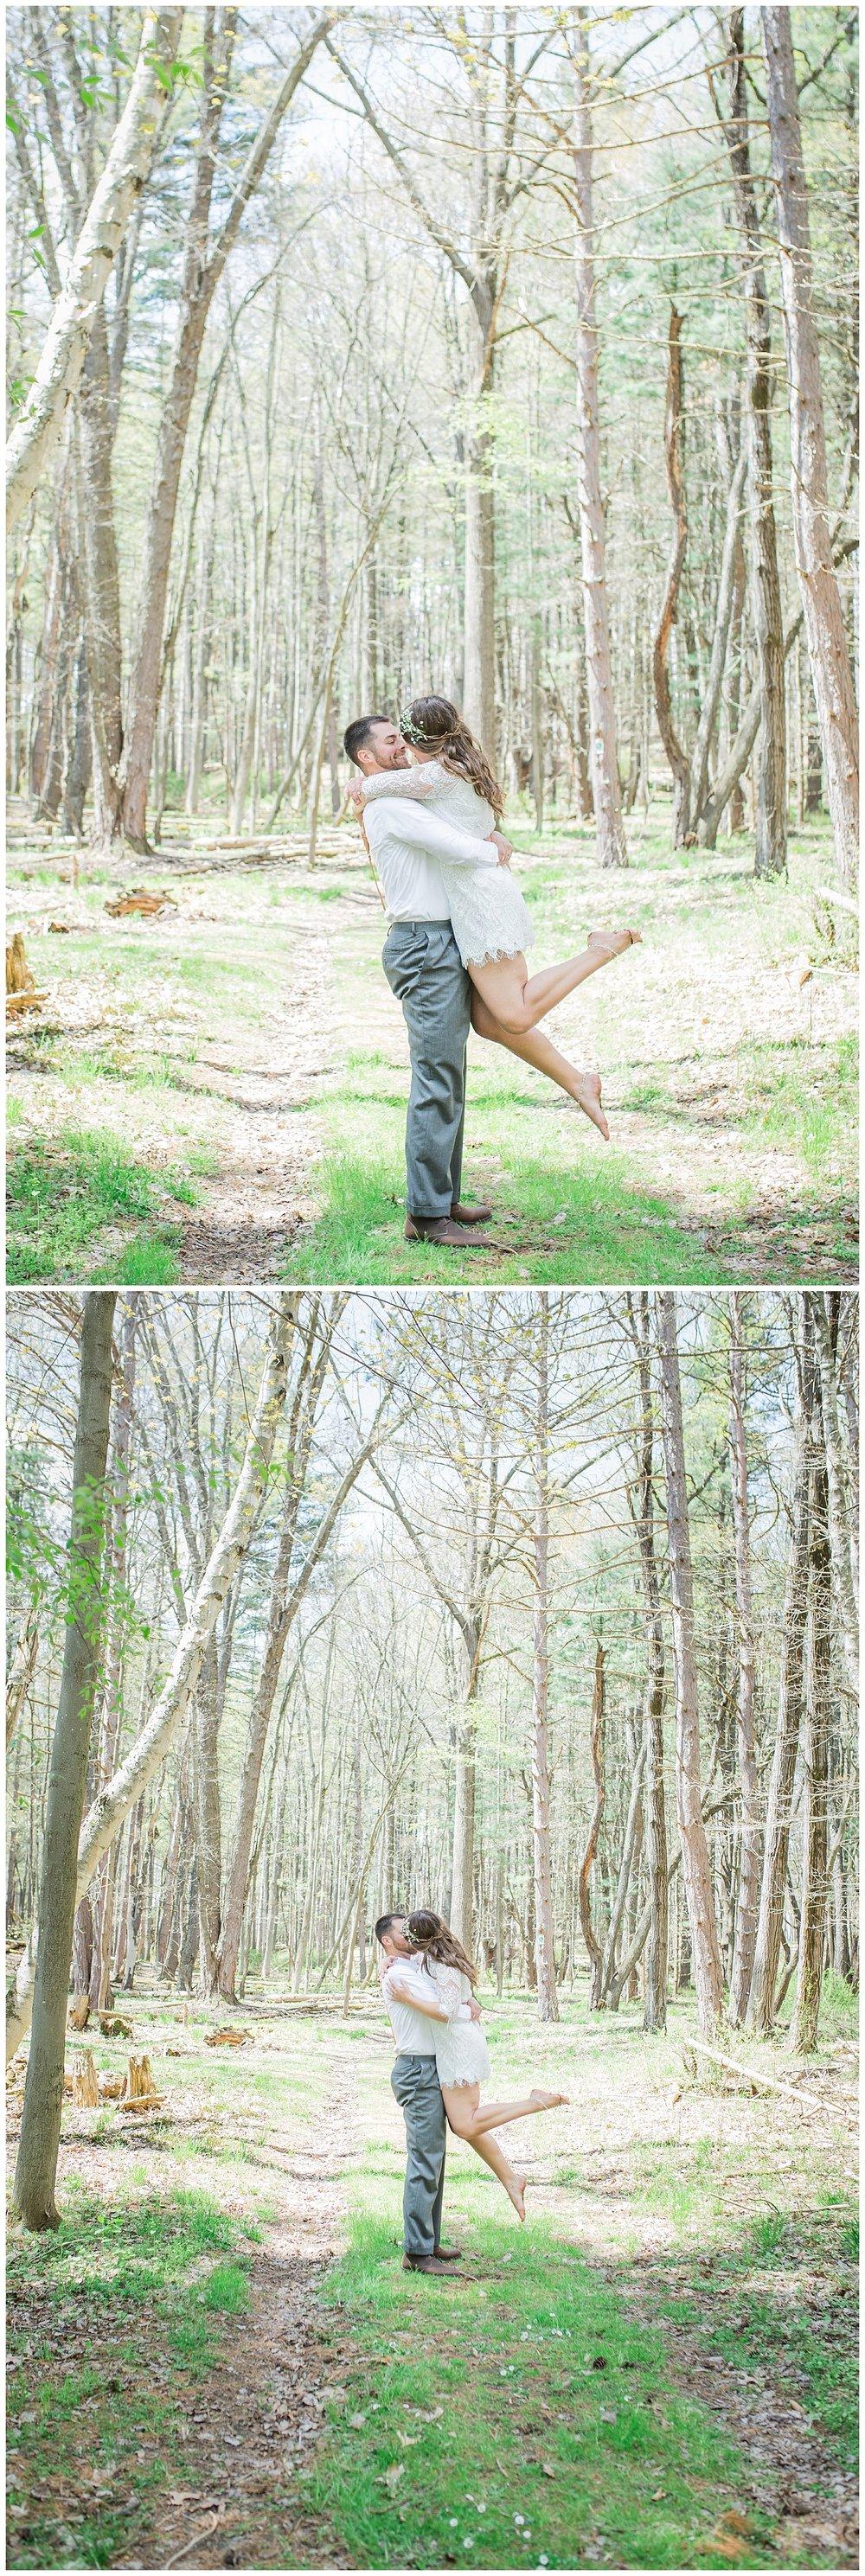 Letchworth state park wedding - whimsical boho romance - rochester 27.jpg